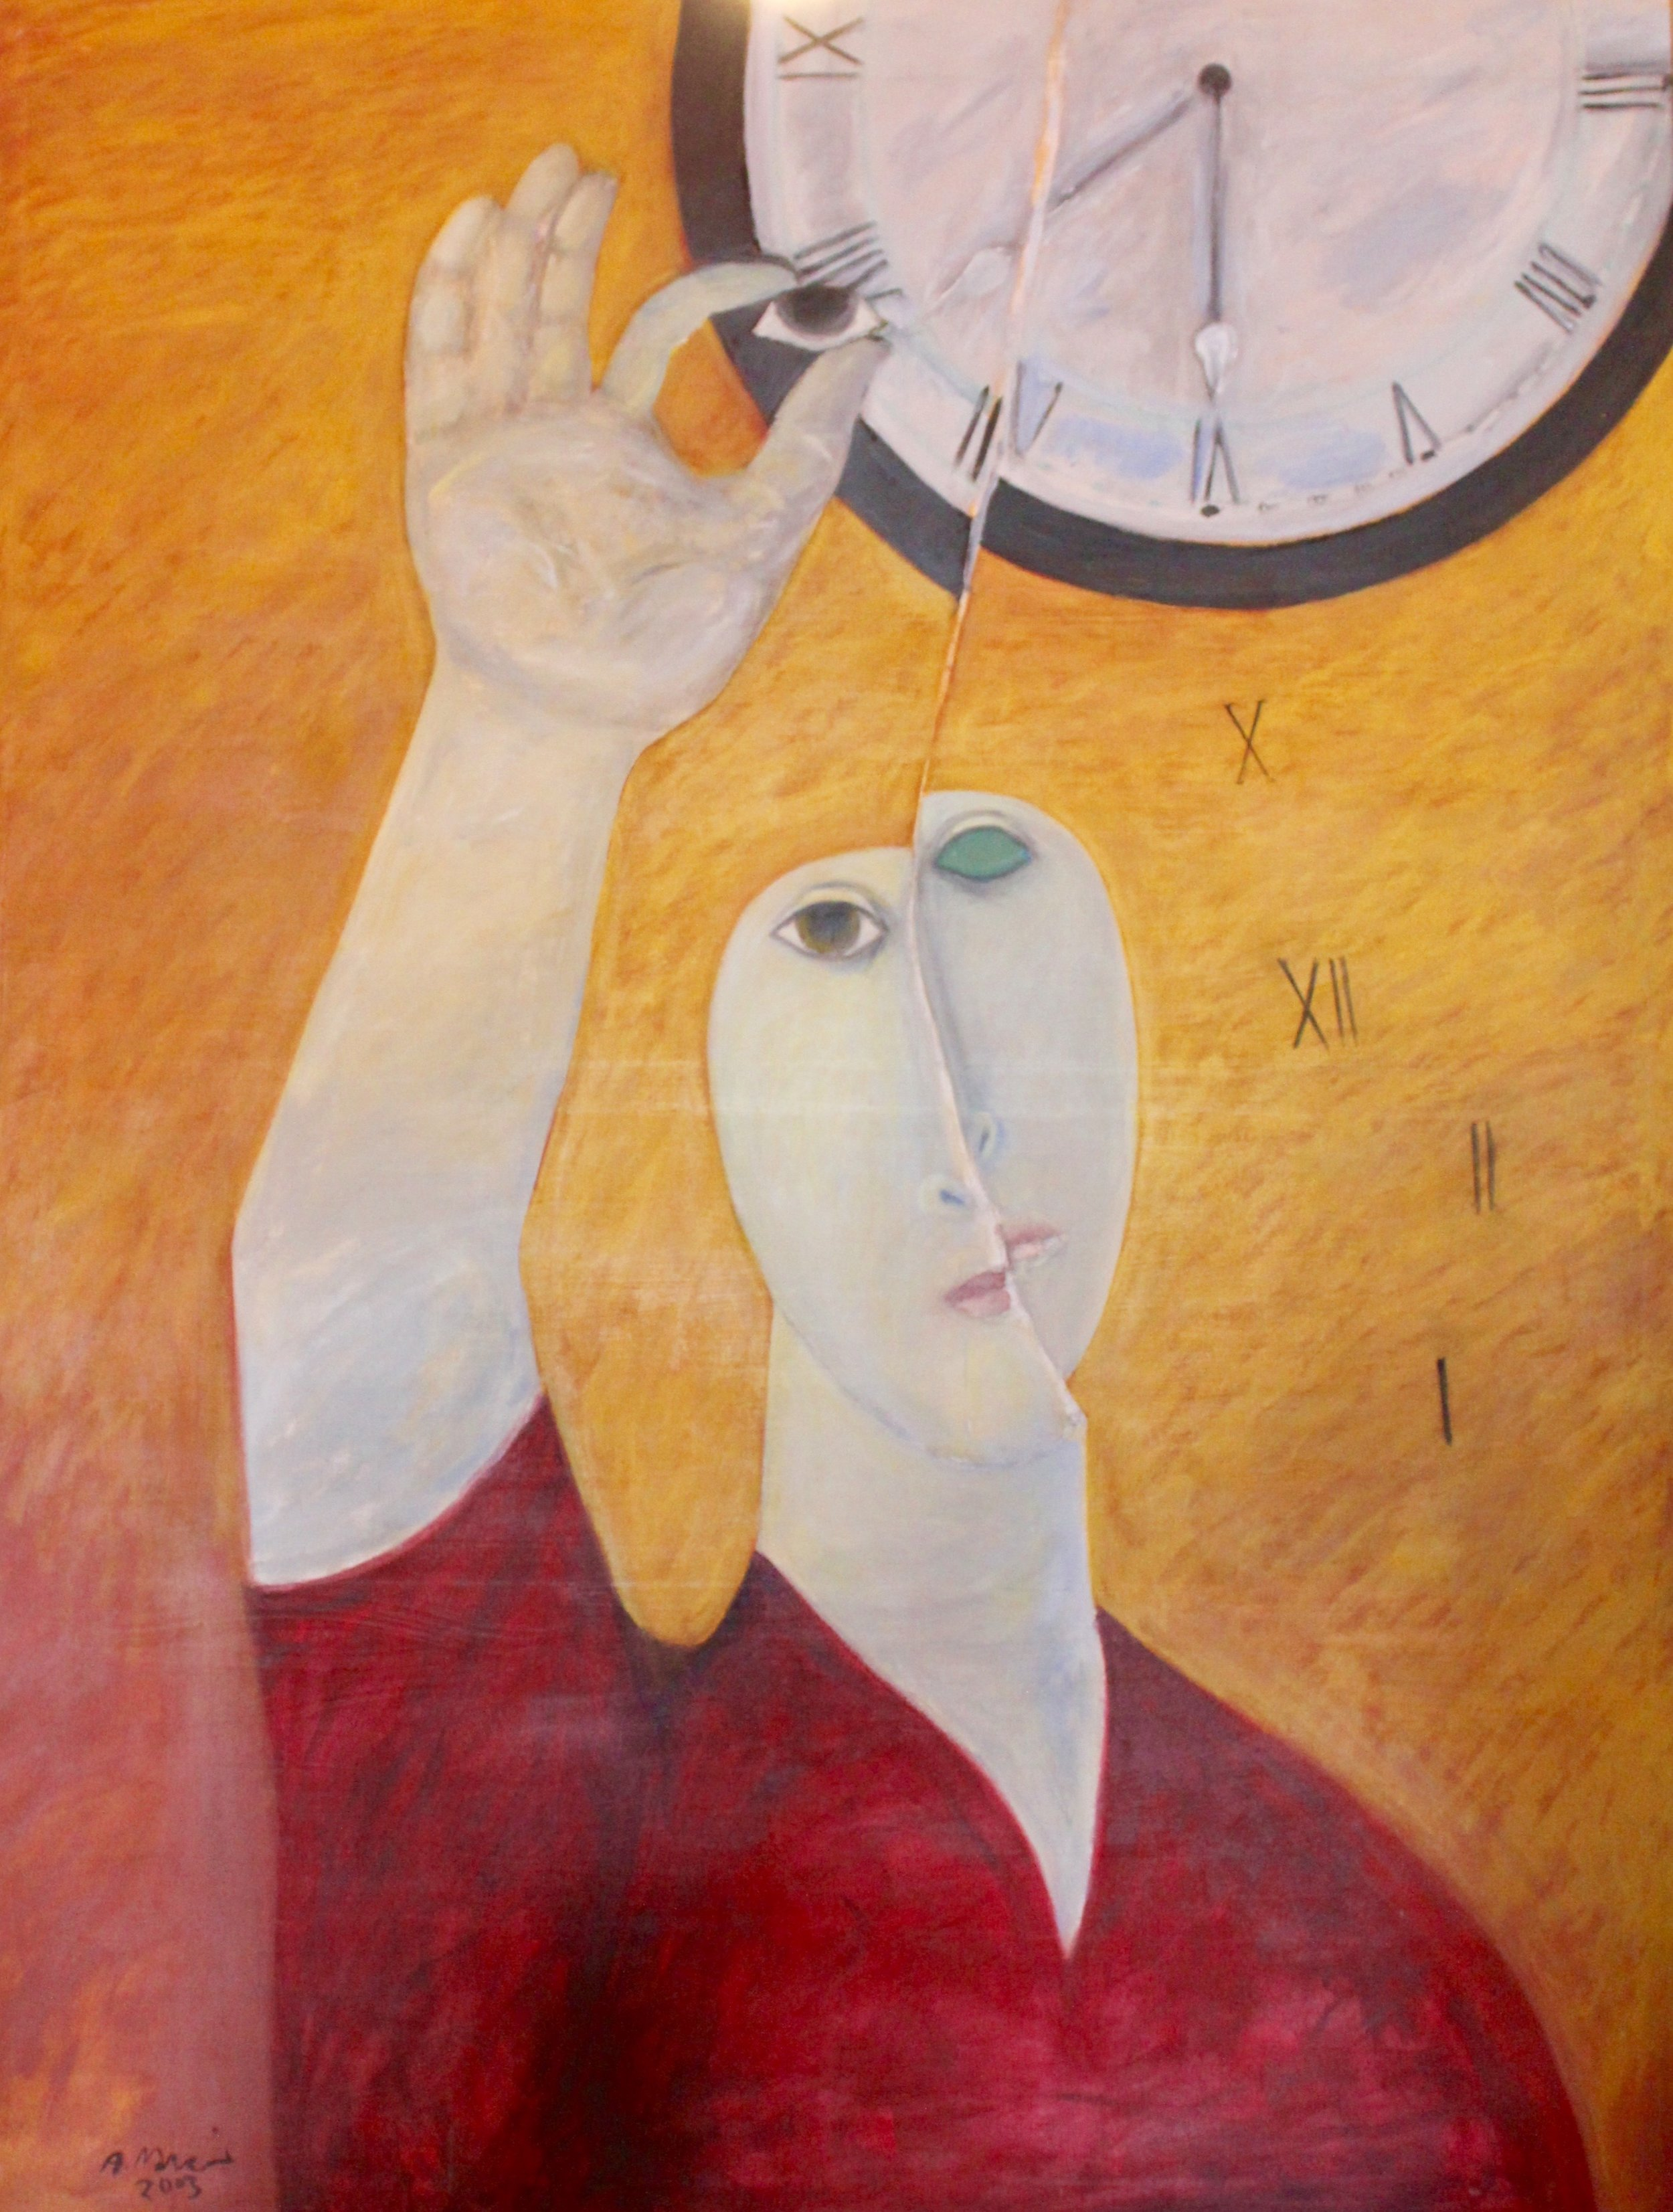 Ahmed_Morsi_Eyeing_Time_2000 copy.jpg